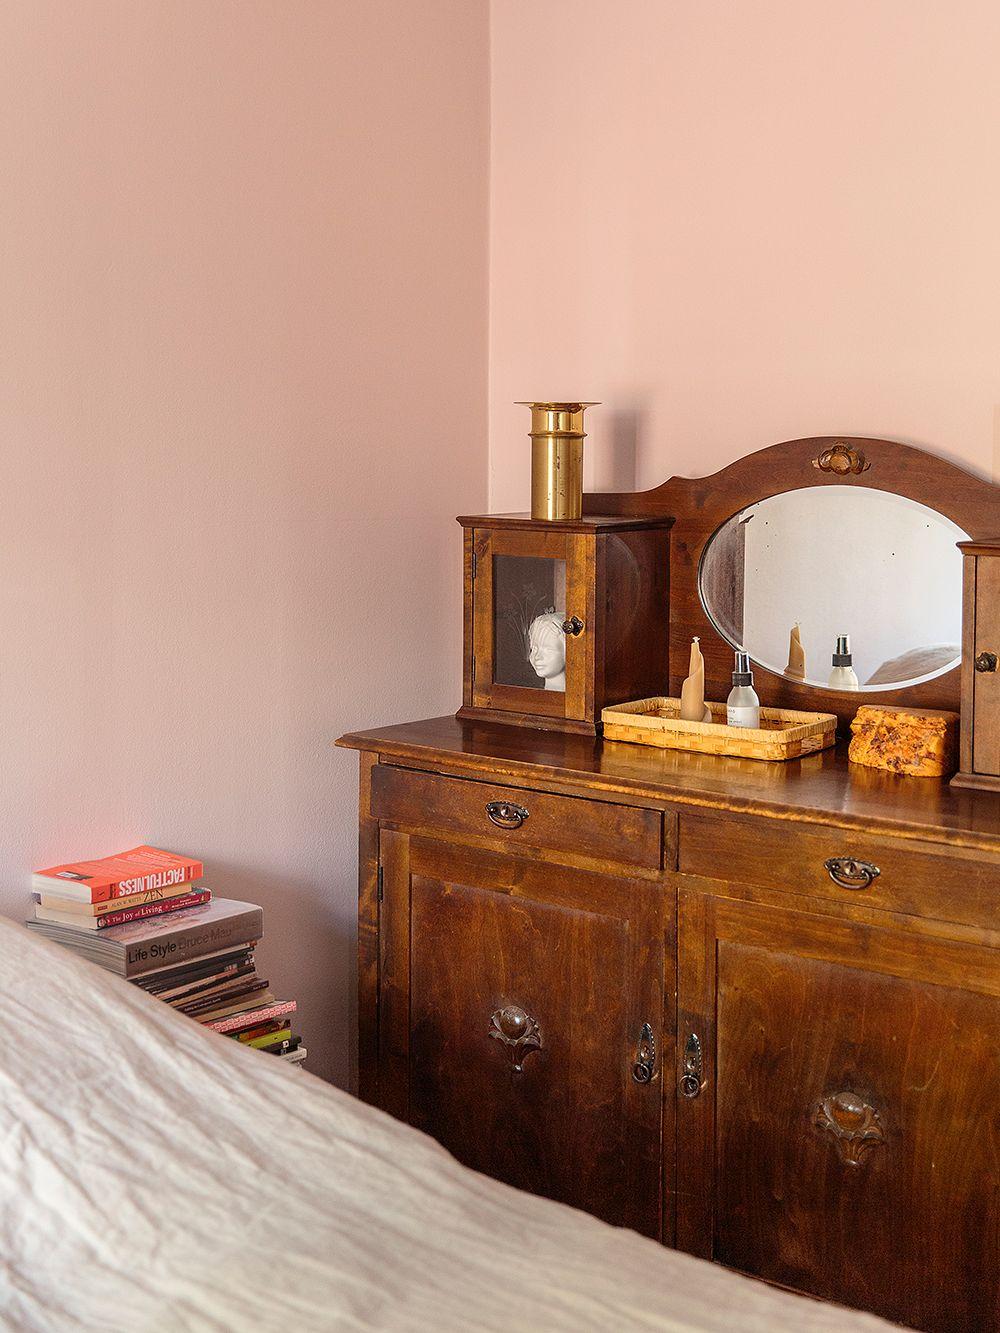 An antique cupboard in the bedroom